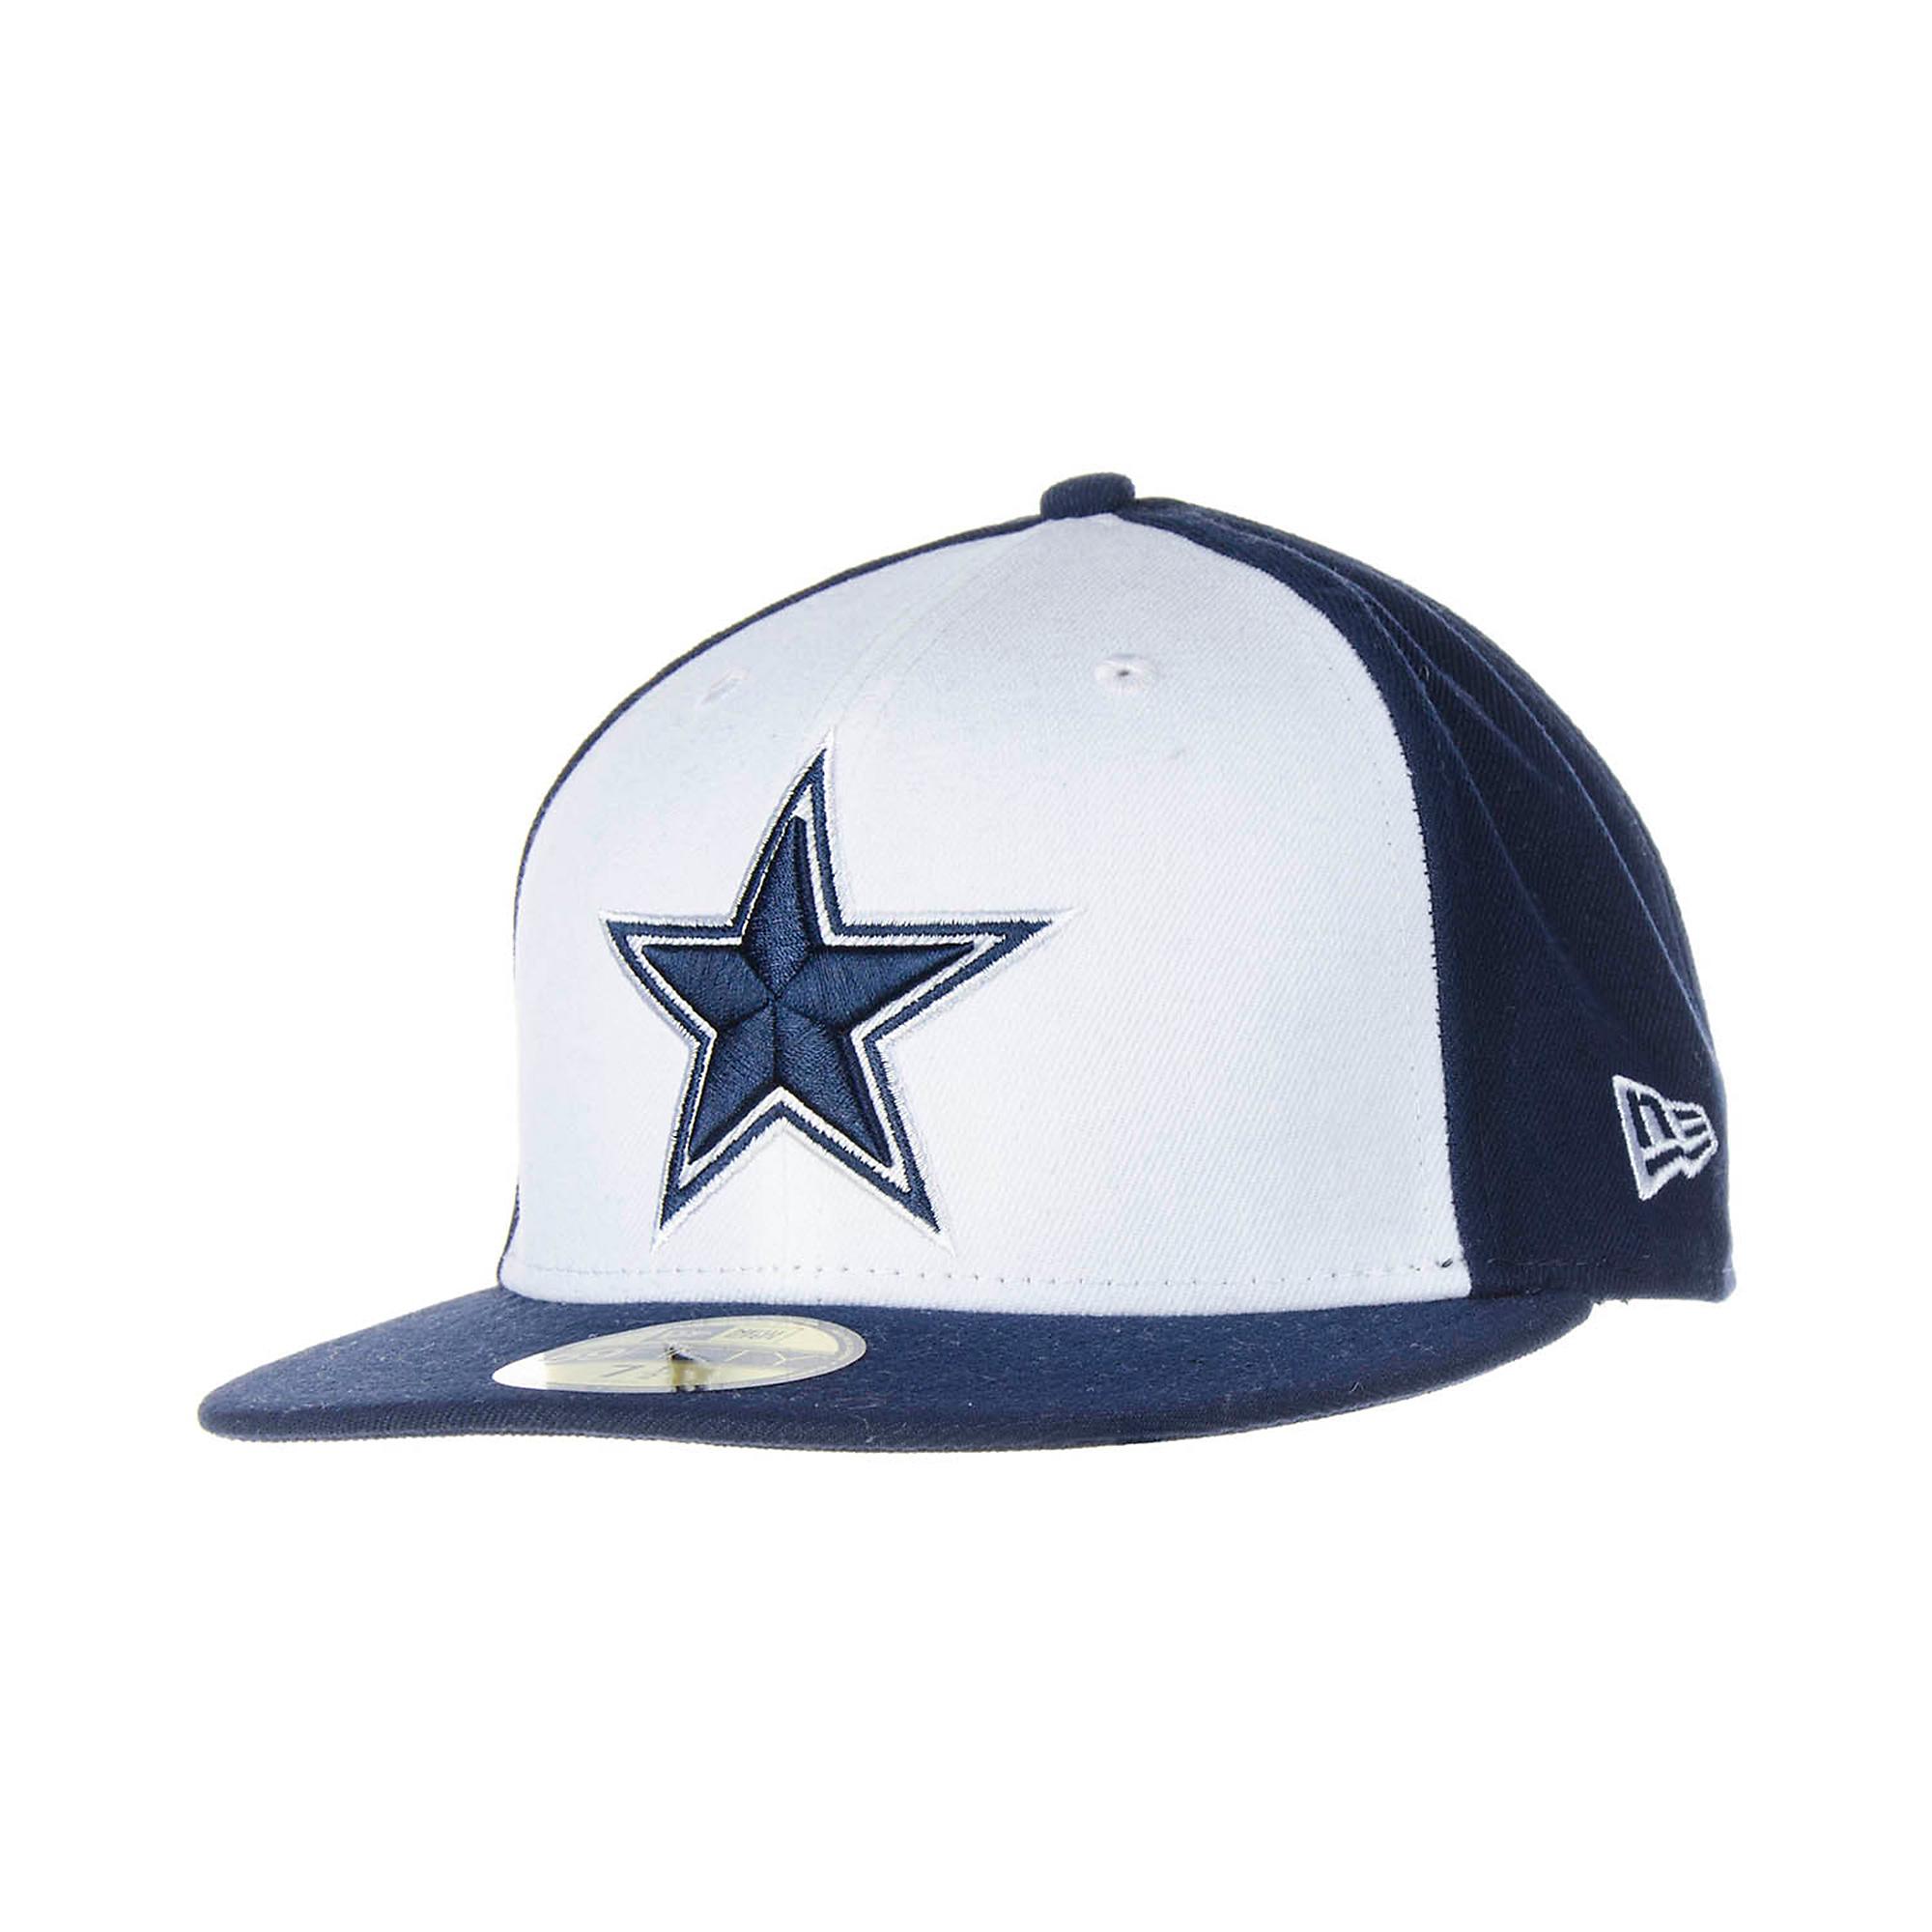 7241b32d736 Dallas Cowboys New Era 59Fifty Sideline Cap